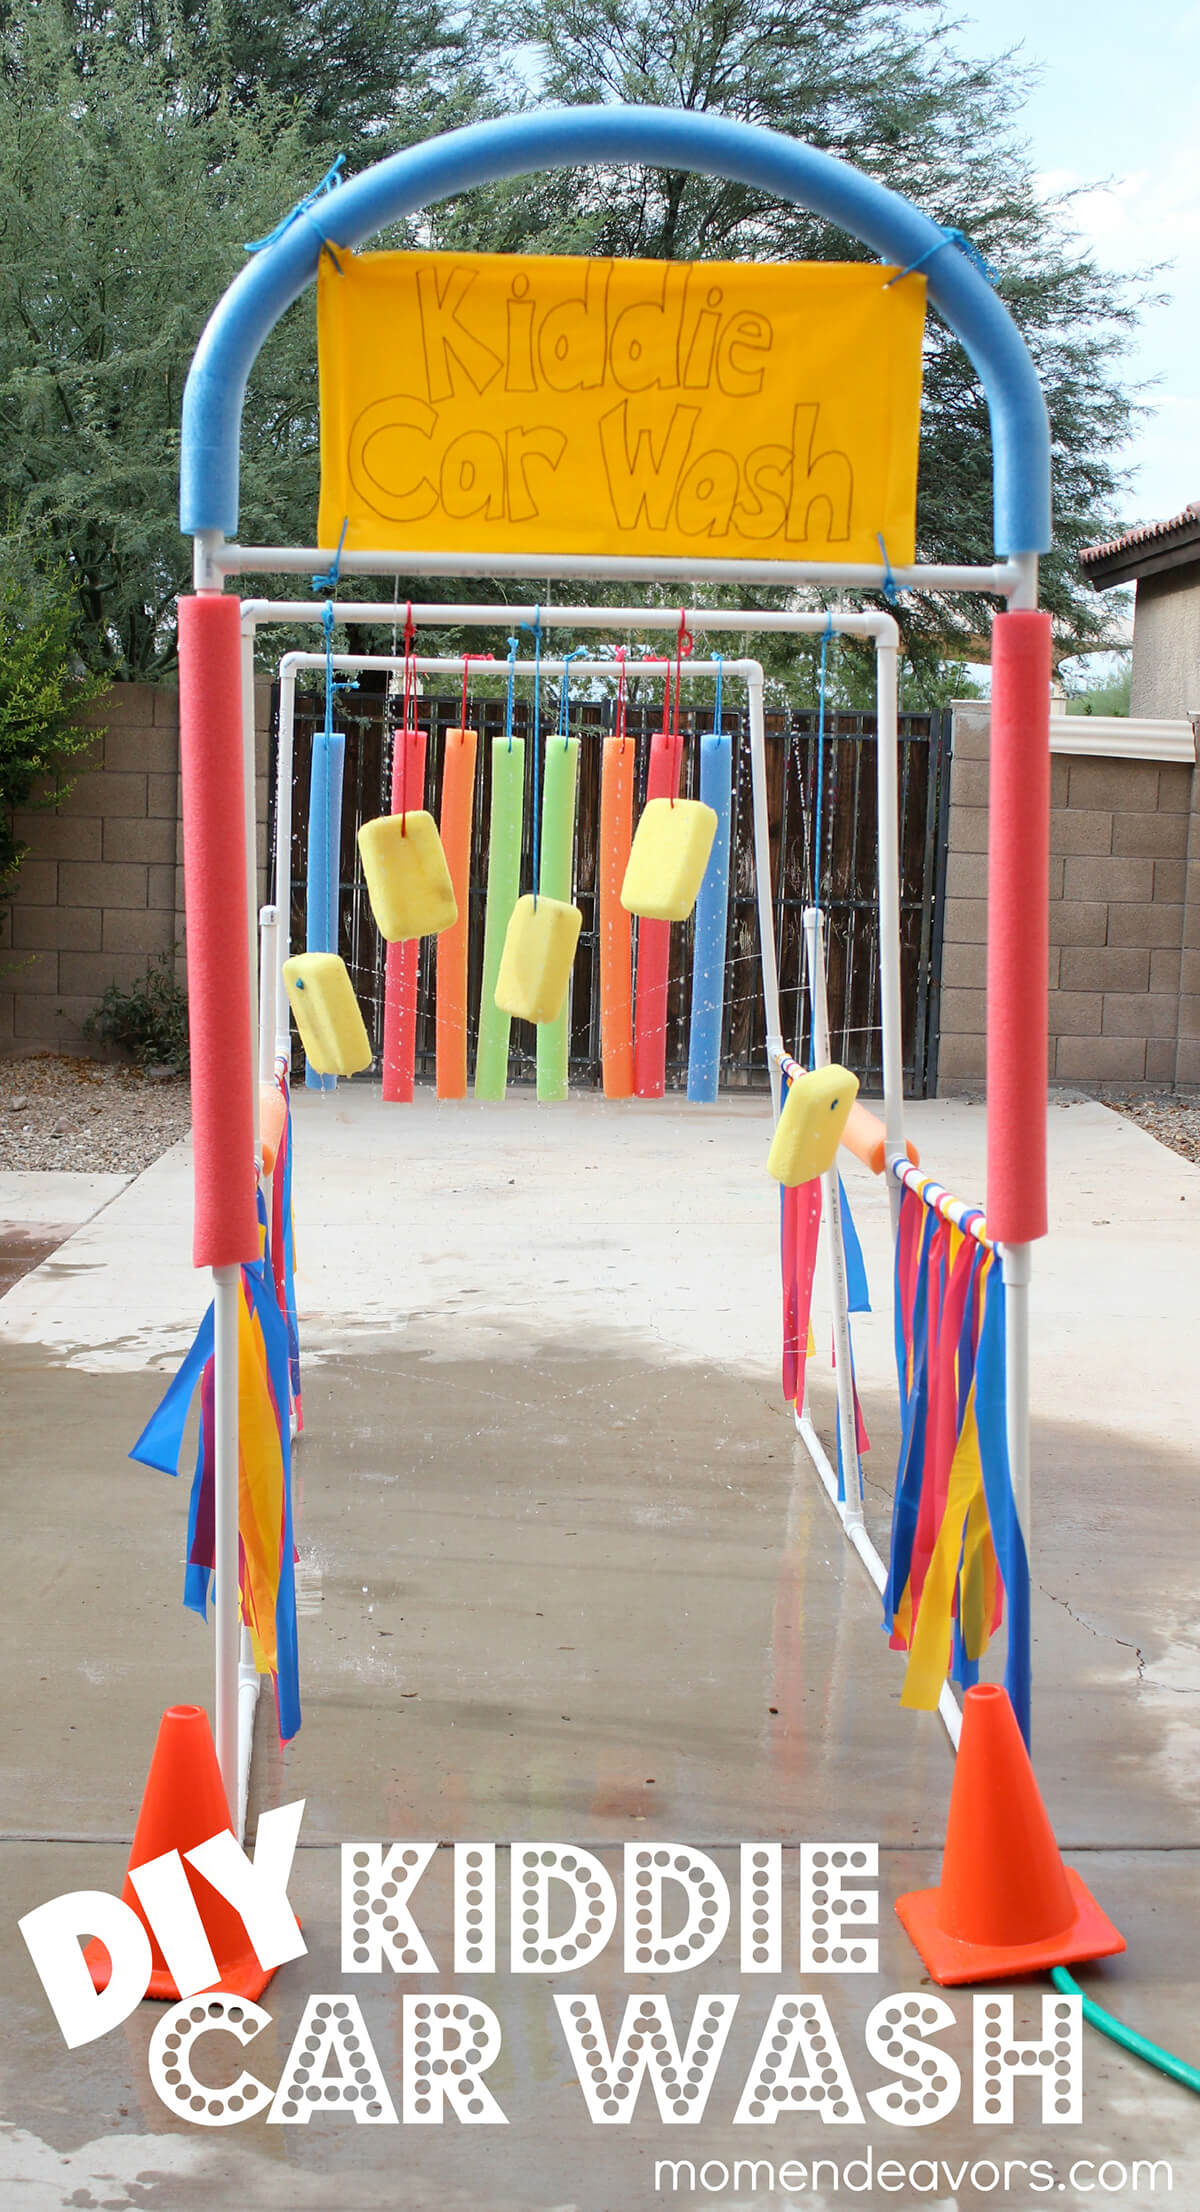 Super-Soaking Kiddie Carwash Sprinkler Setup